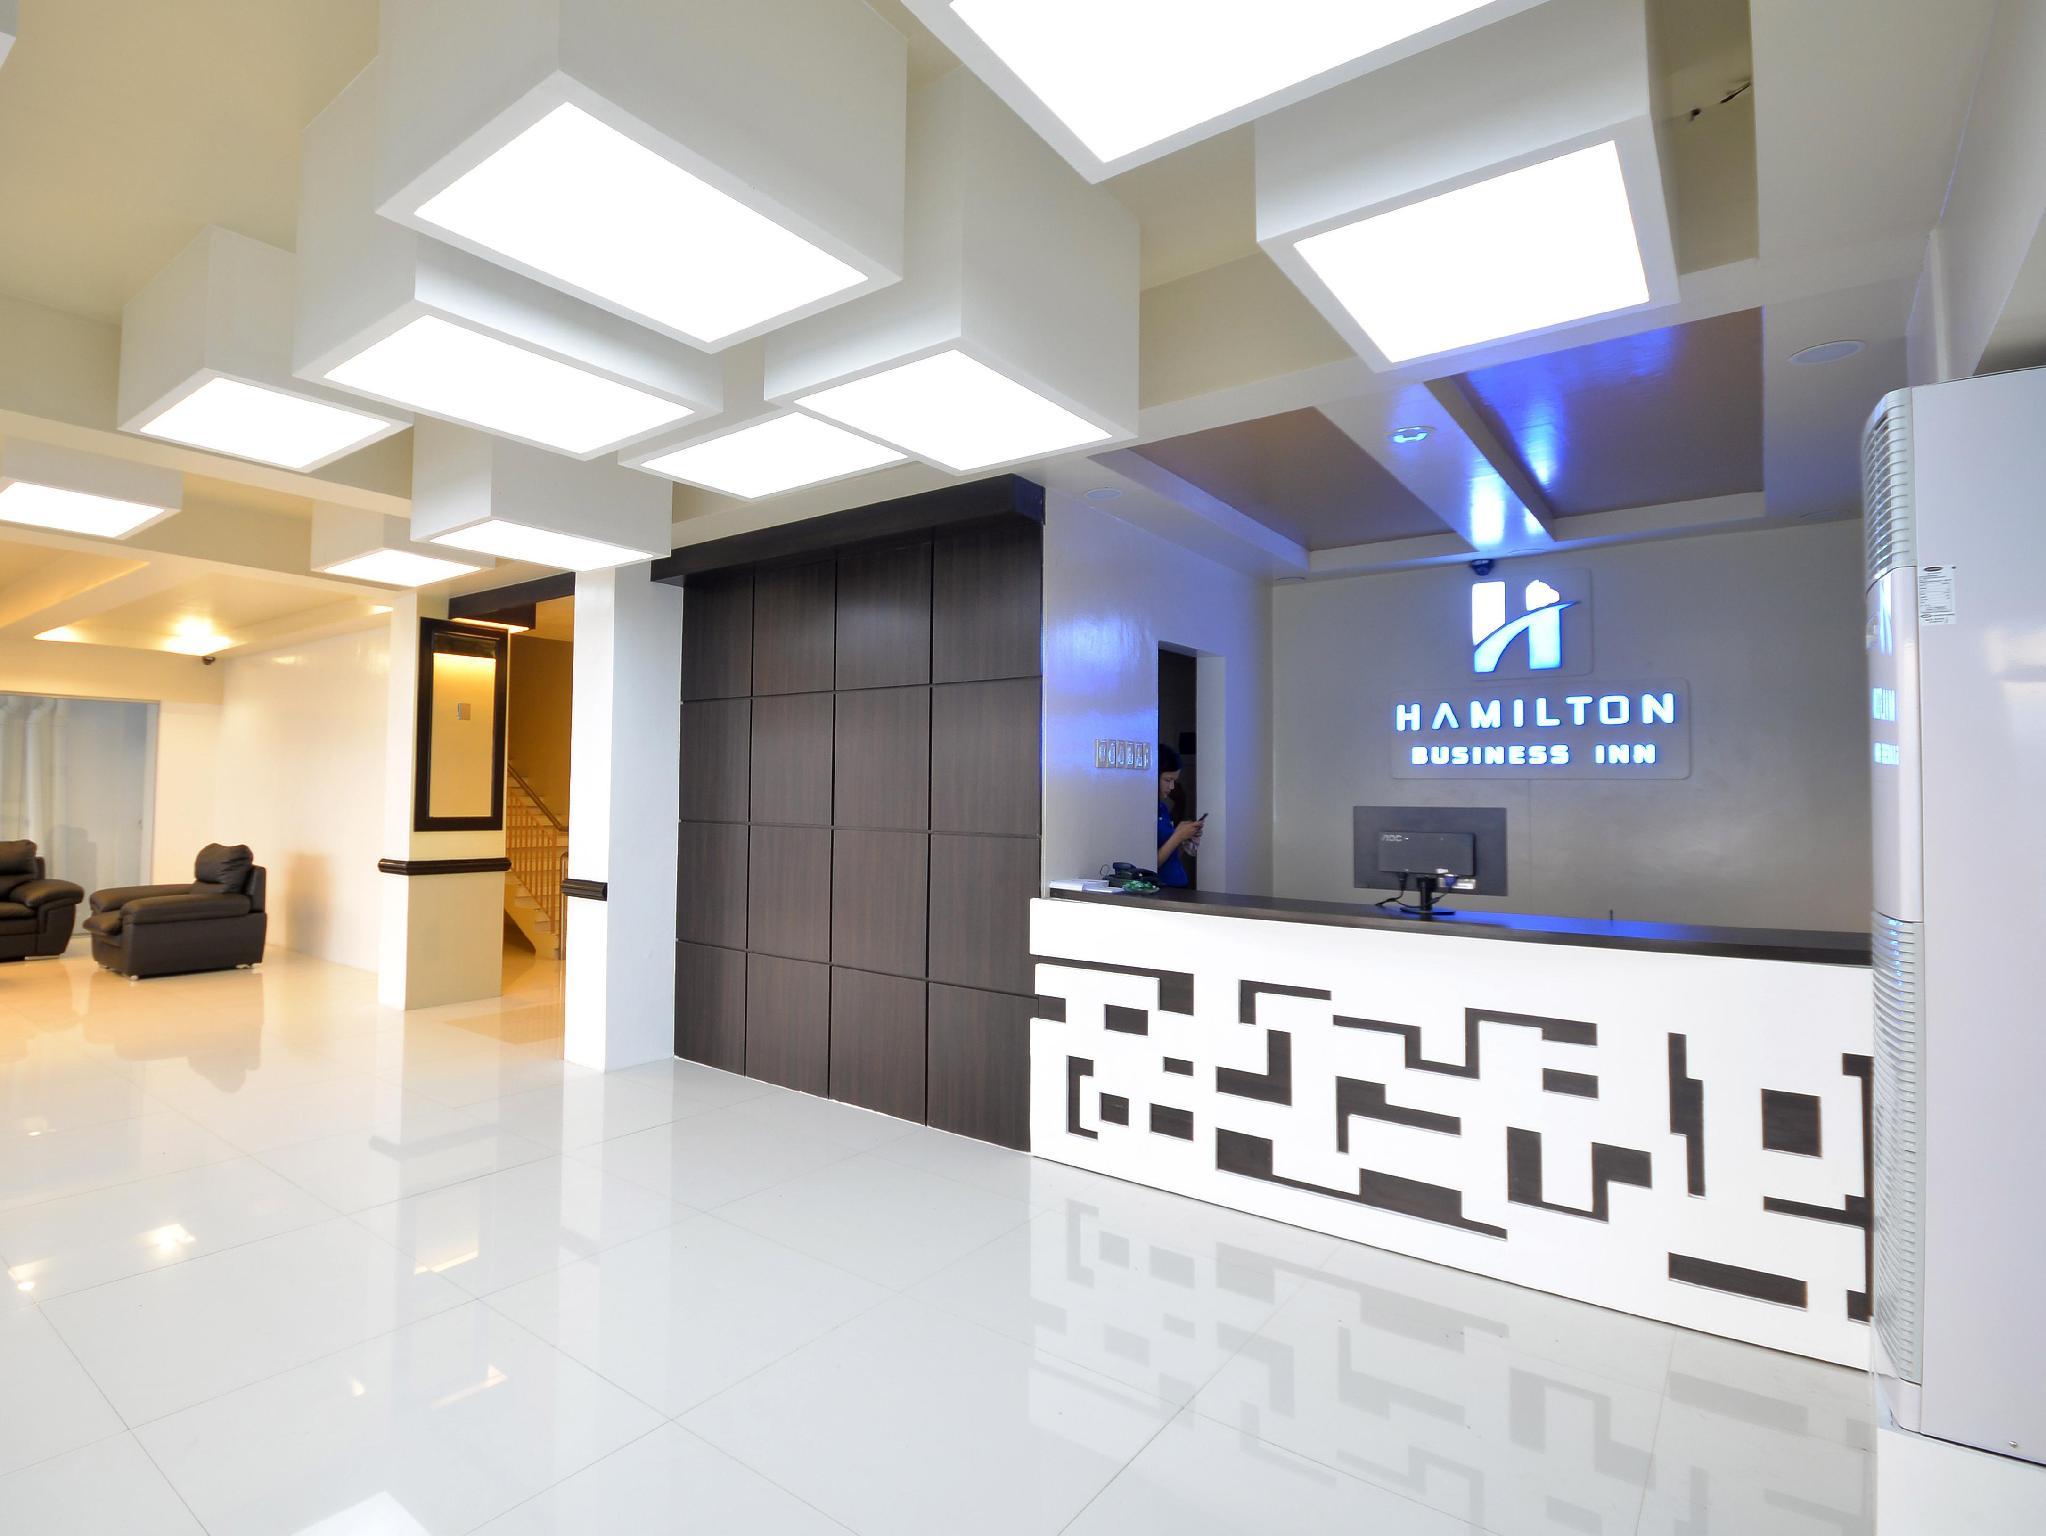 Hamilton Business Inn, Zamboanga City